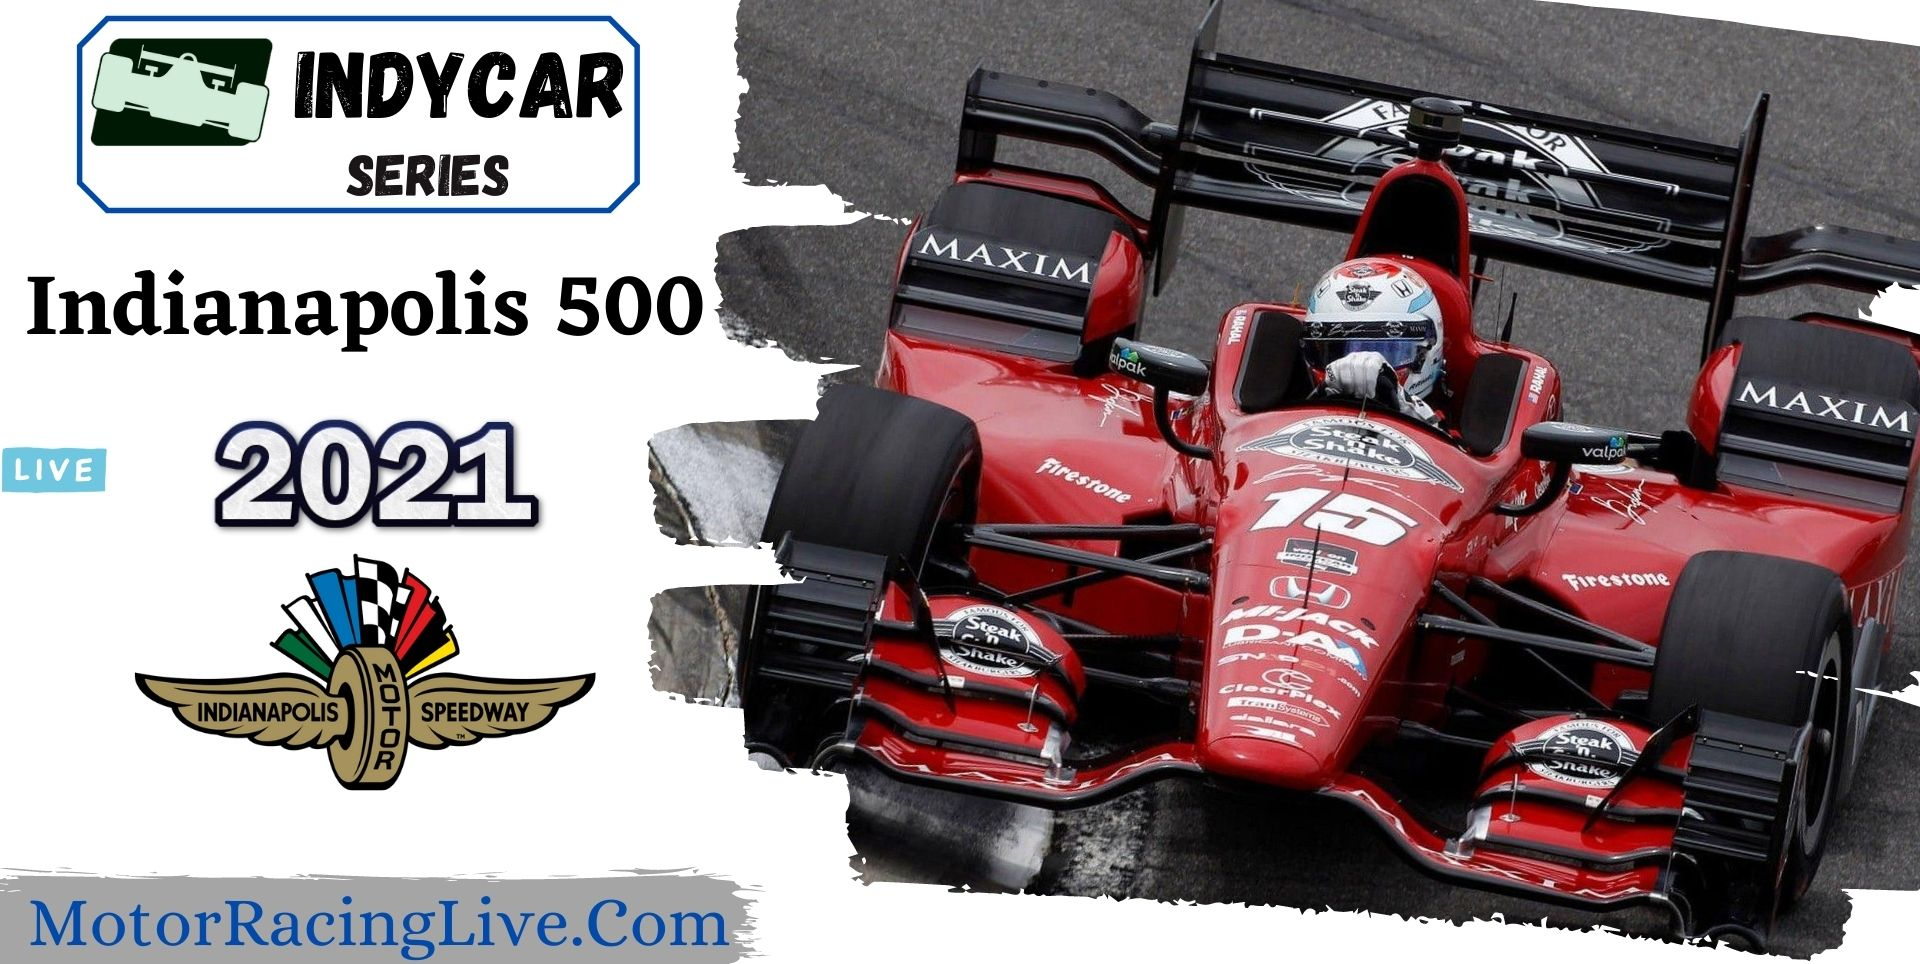 Indianapolis 500 GP Live Stream 2021 | Indycar